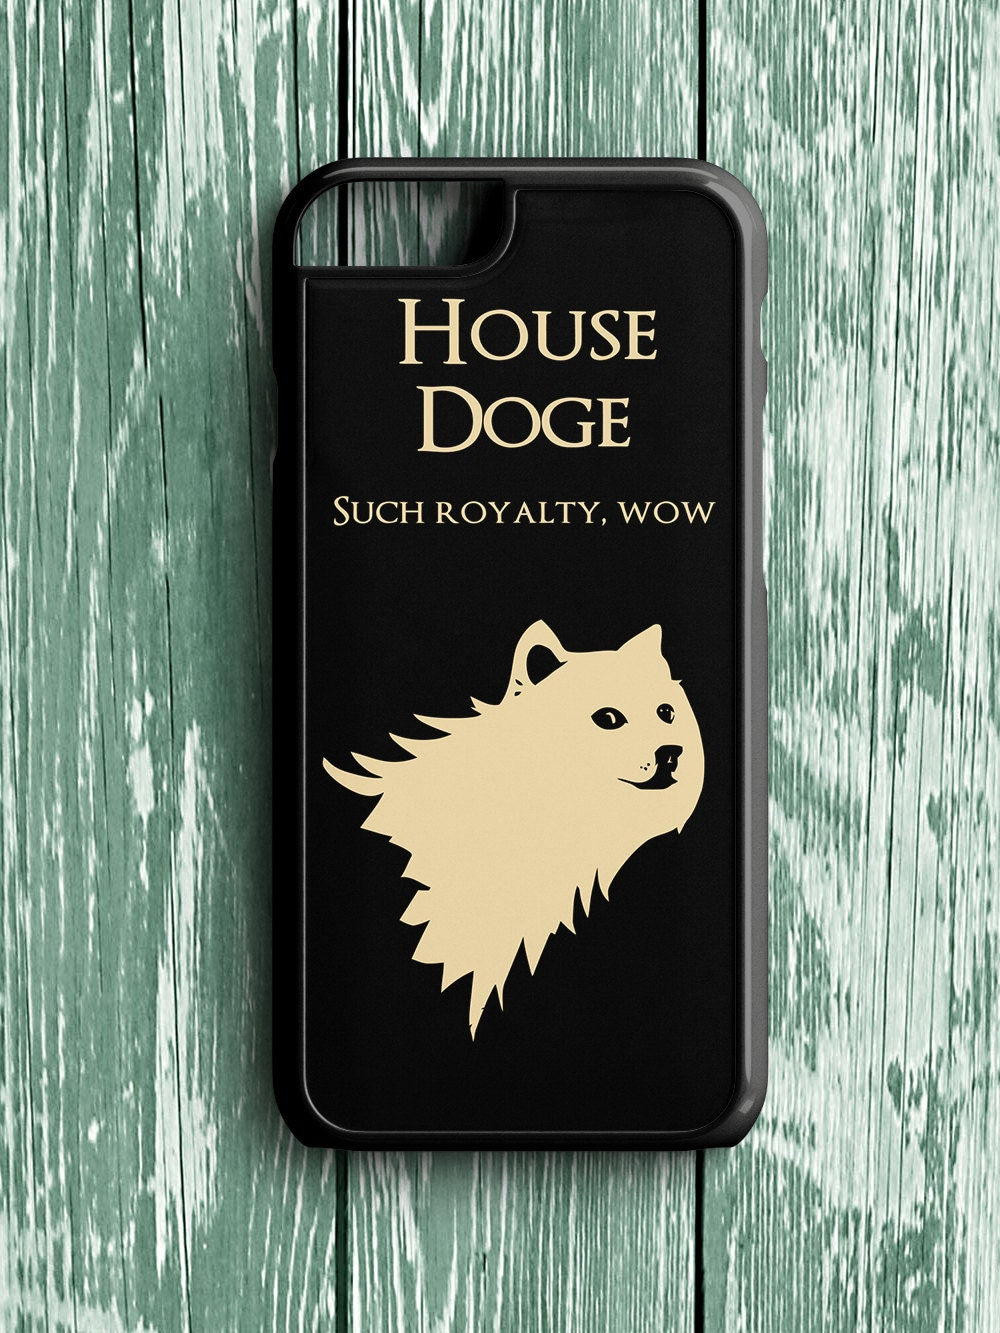 Case Design phone credit card case : Doge iPhone 6 Case Game of Thrones iPhone 5s Case Doge Game